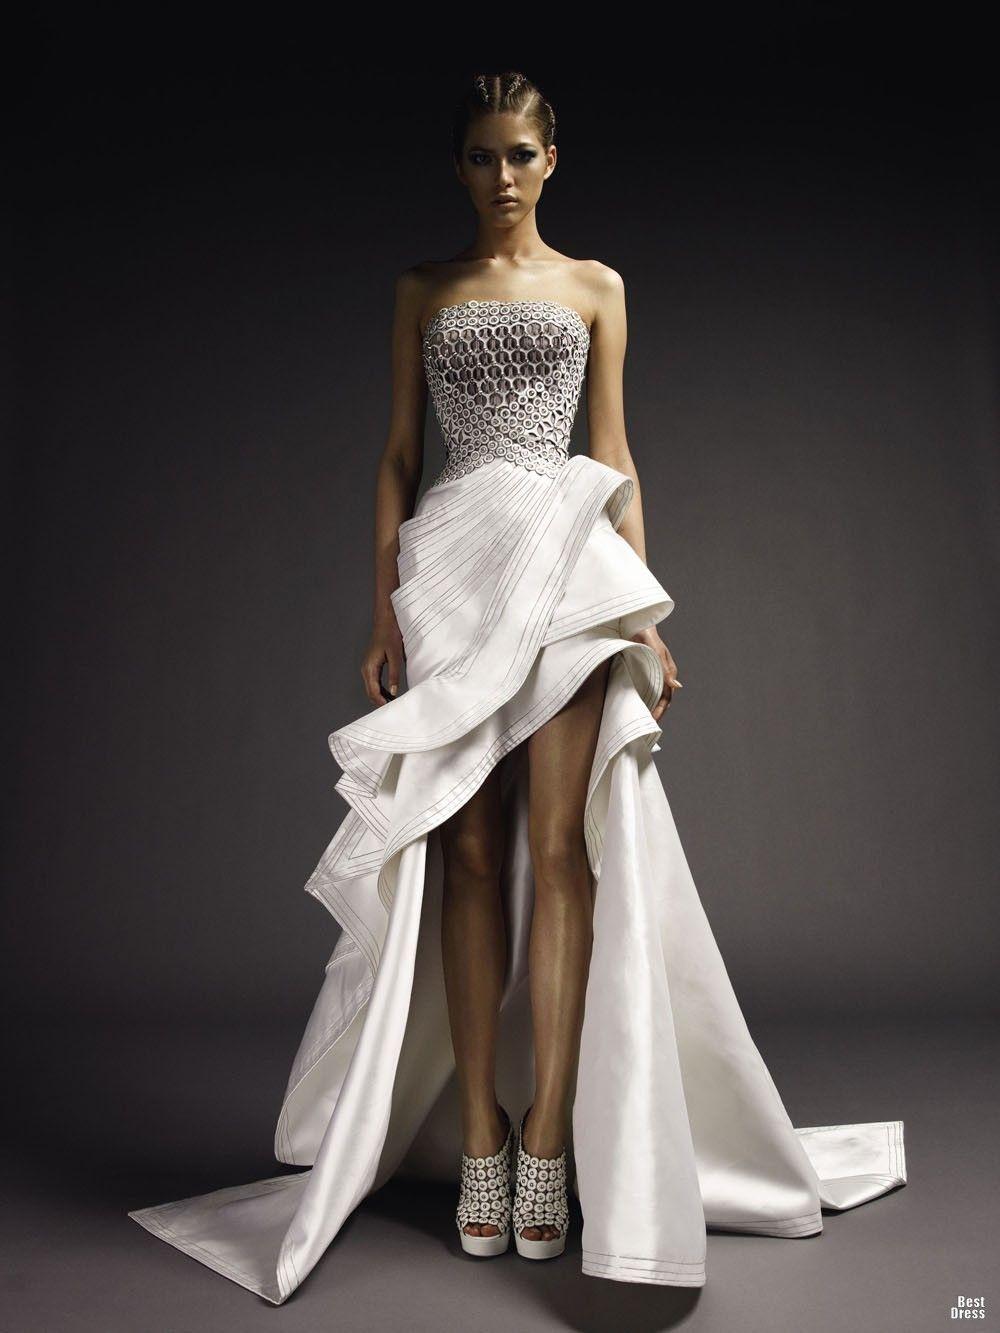 Versace wedding dress  Atelier Versace  Edgy wedding dress  Wedding dresses